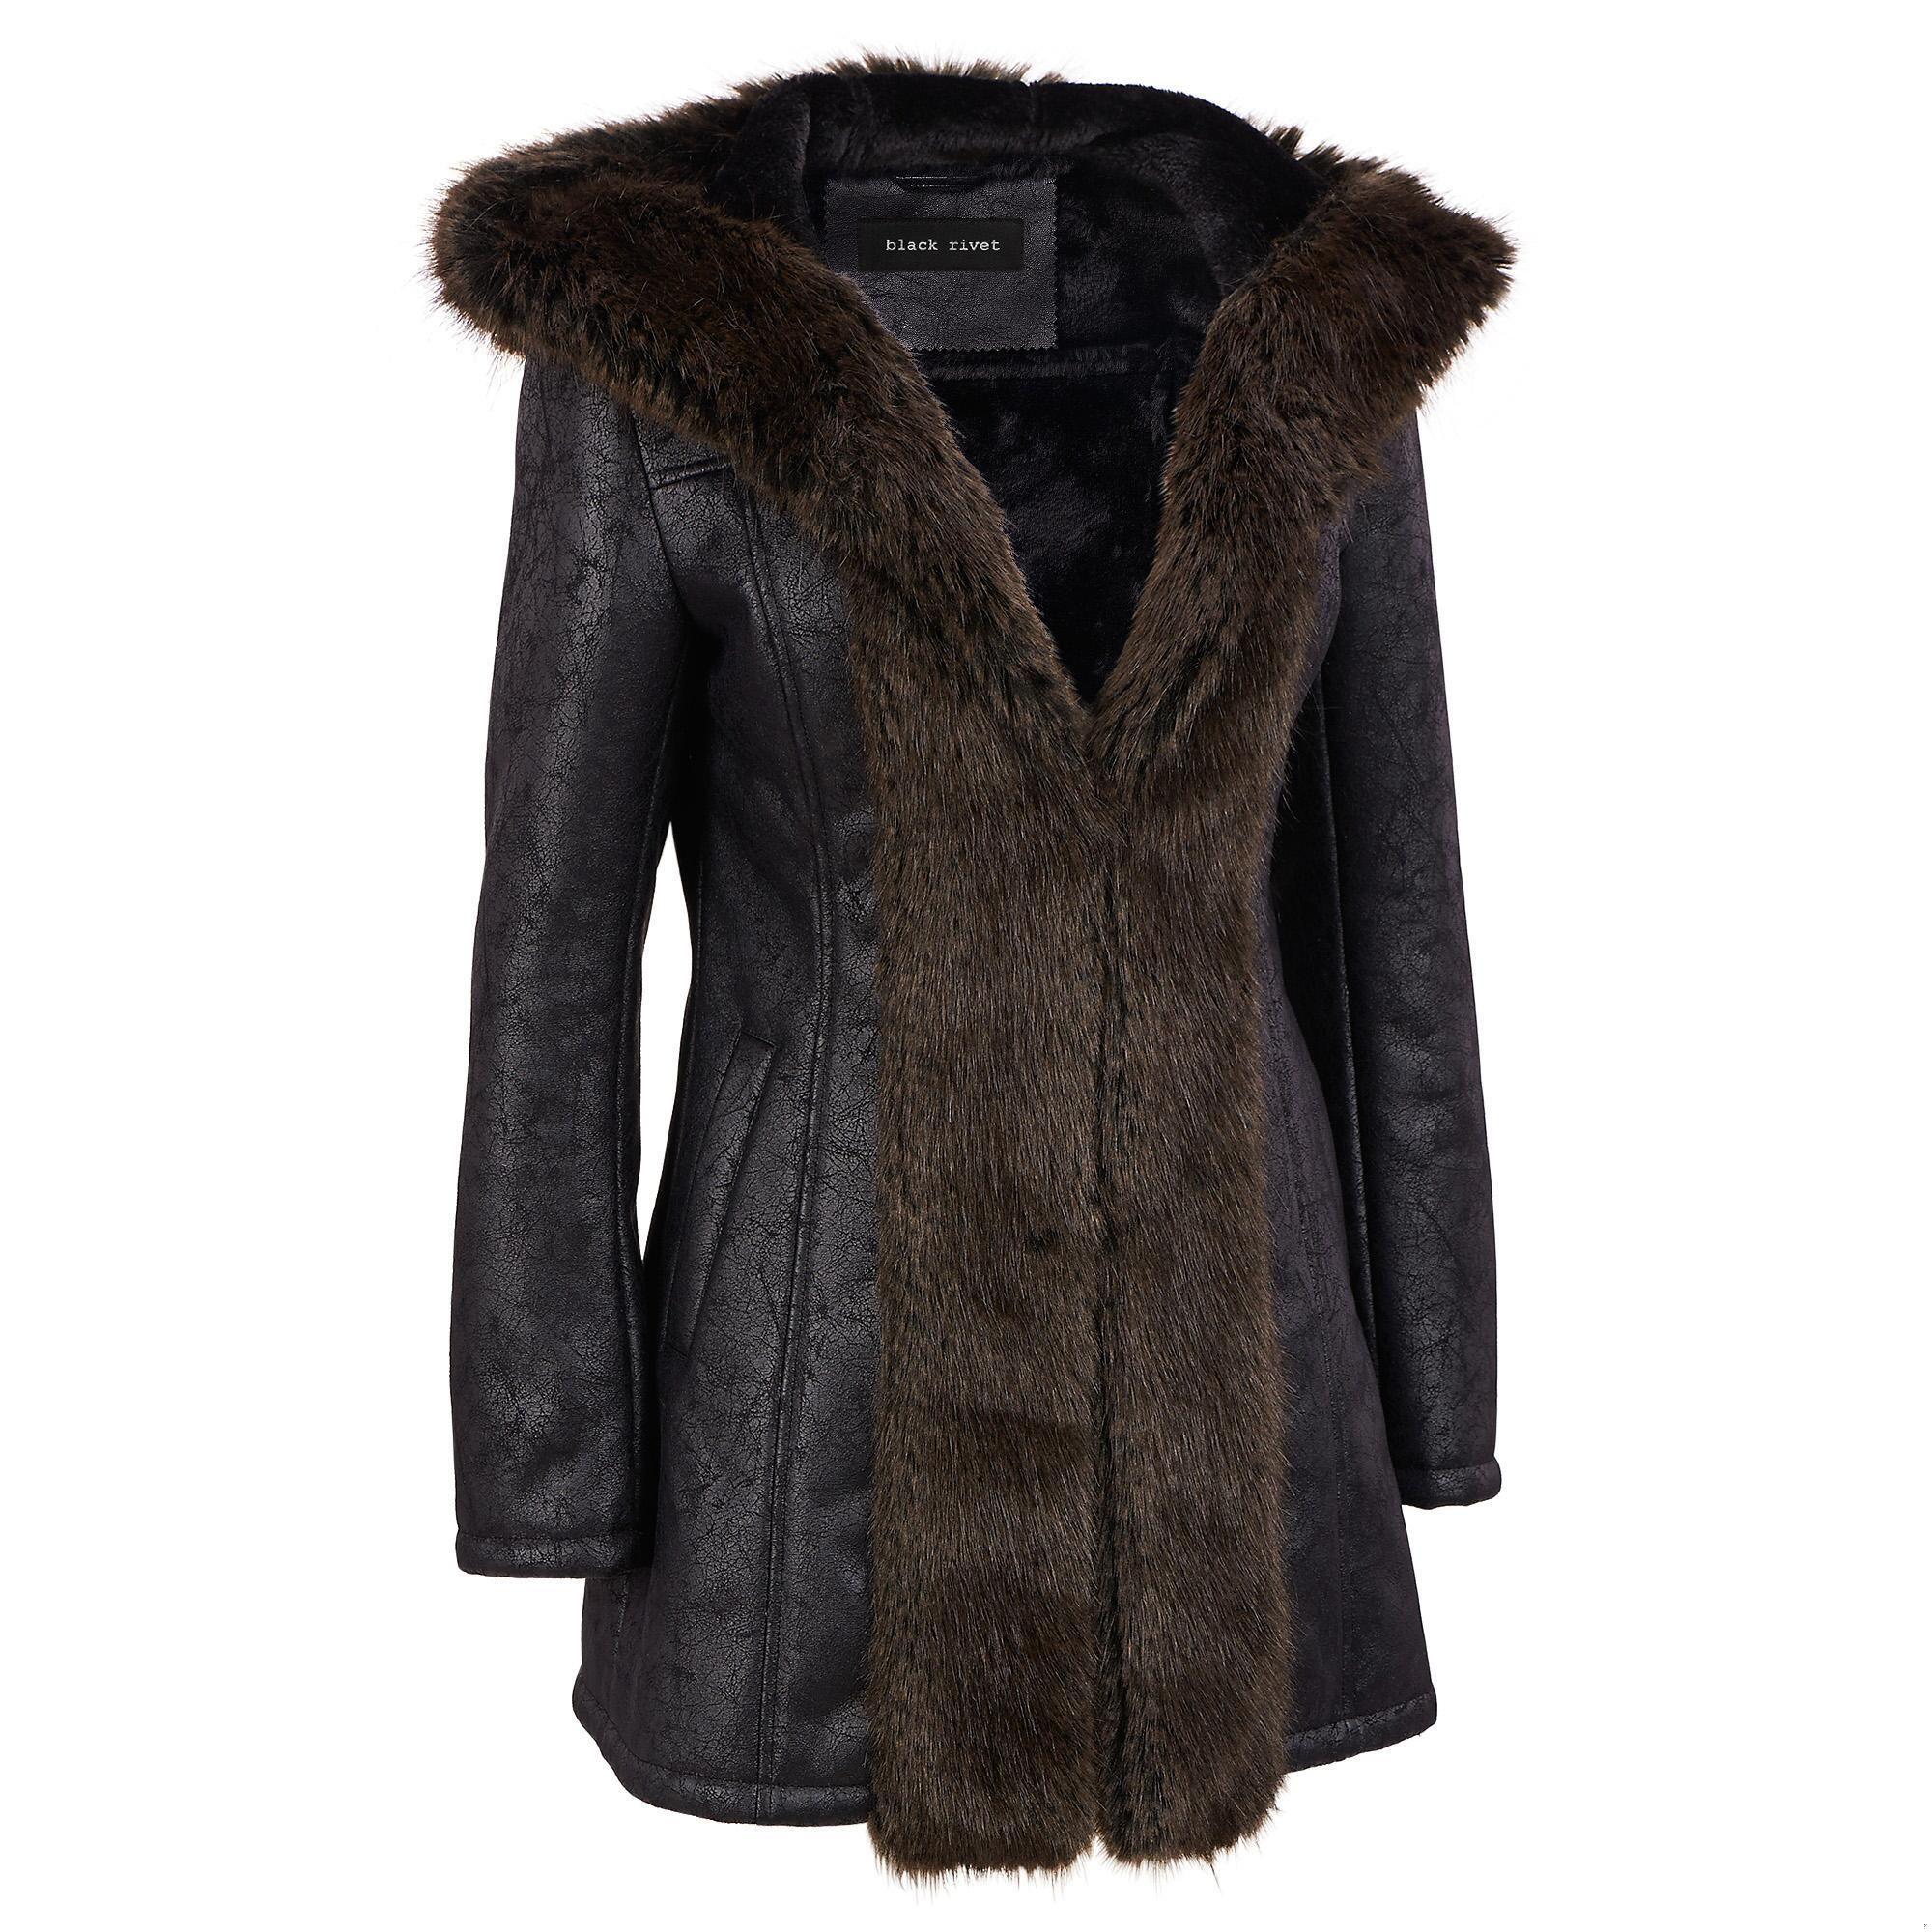 Black Rivet Hooded Distressed FauxLeather Coat w/FauxFur